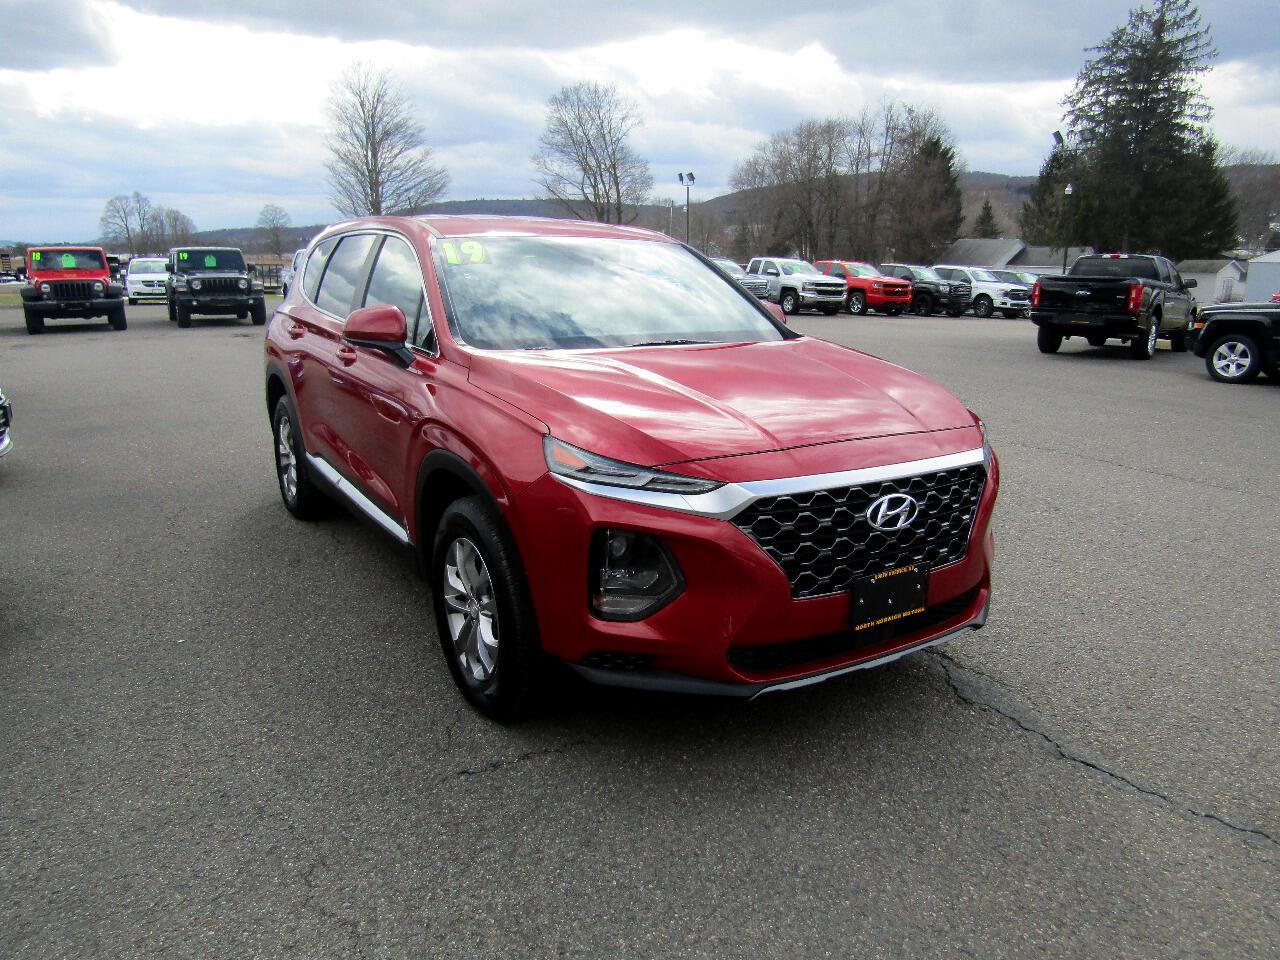 Hyundai Santa Fe SE 2.4L Auto AWD 2019